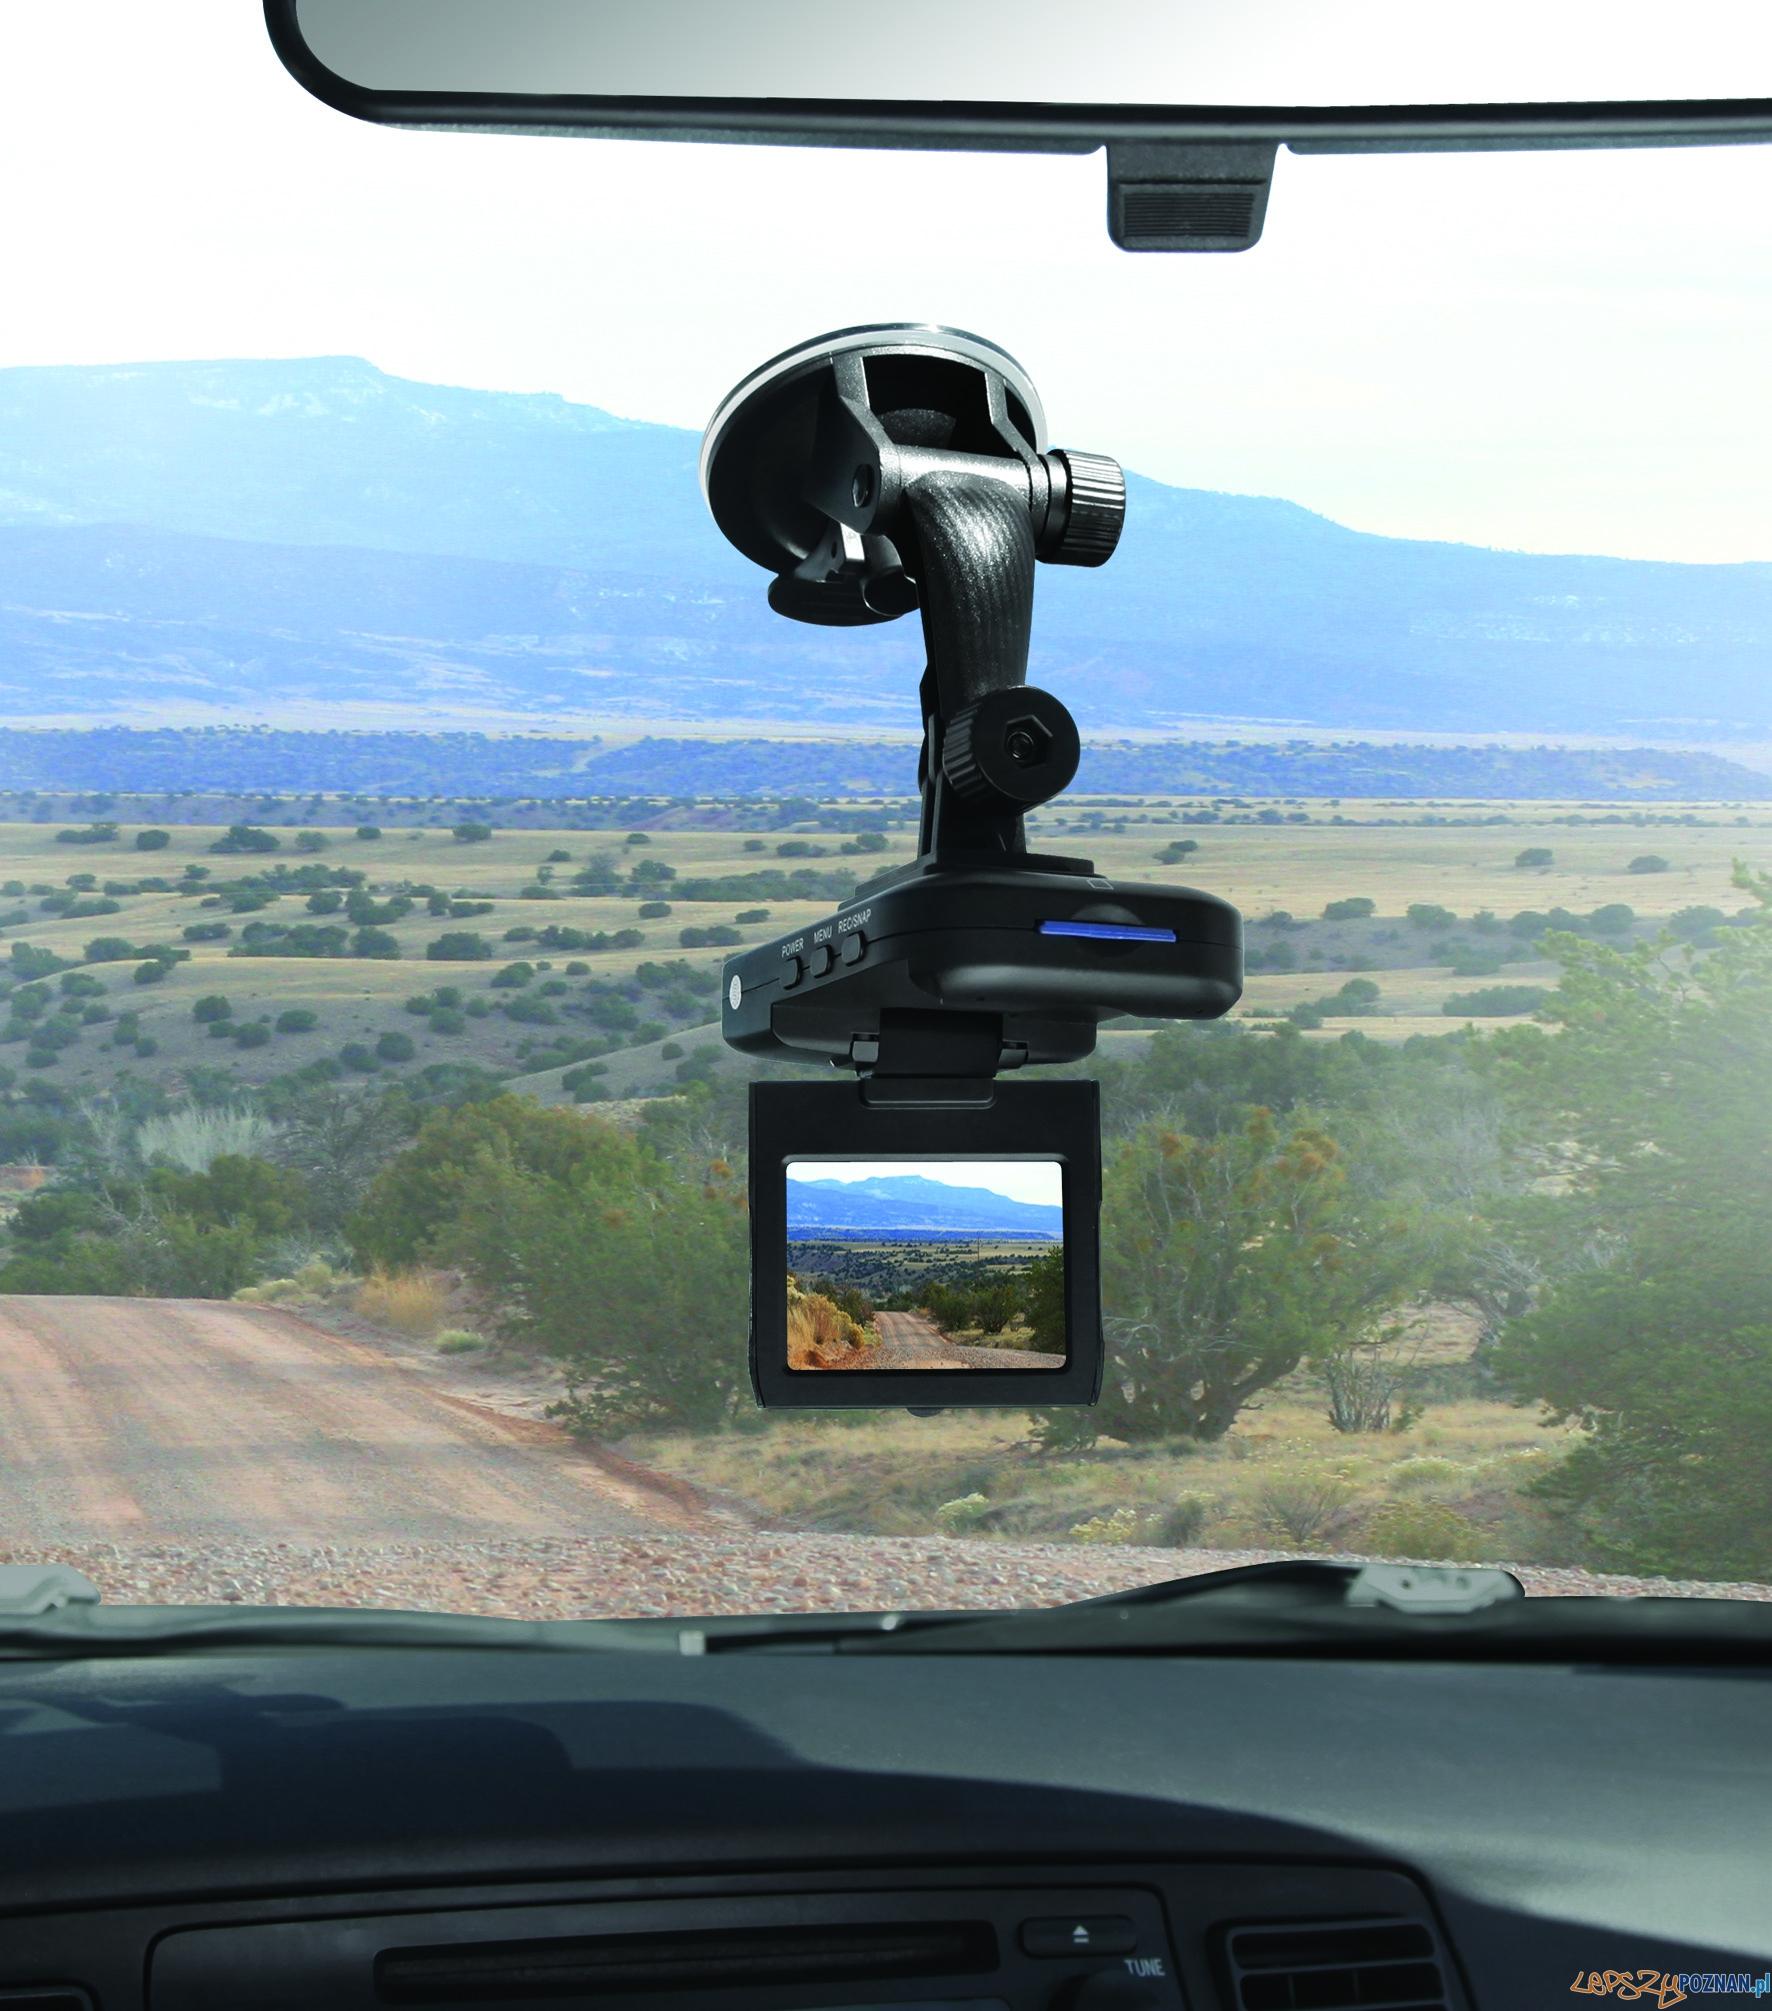 The Roadtrip Video Recorder  Foto: Hammacher Schlemmer